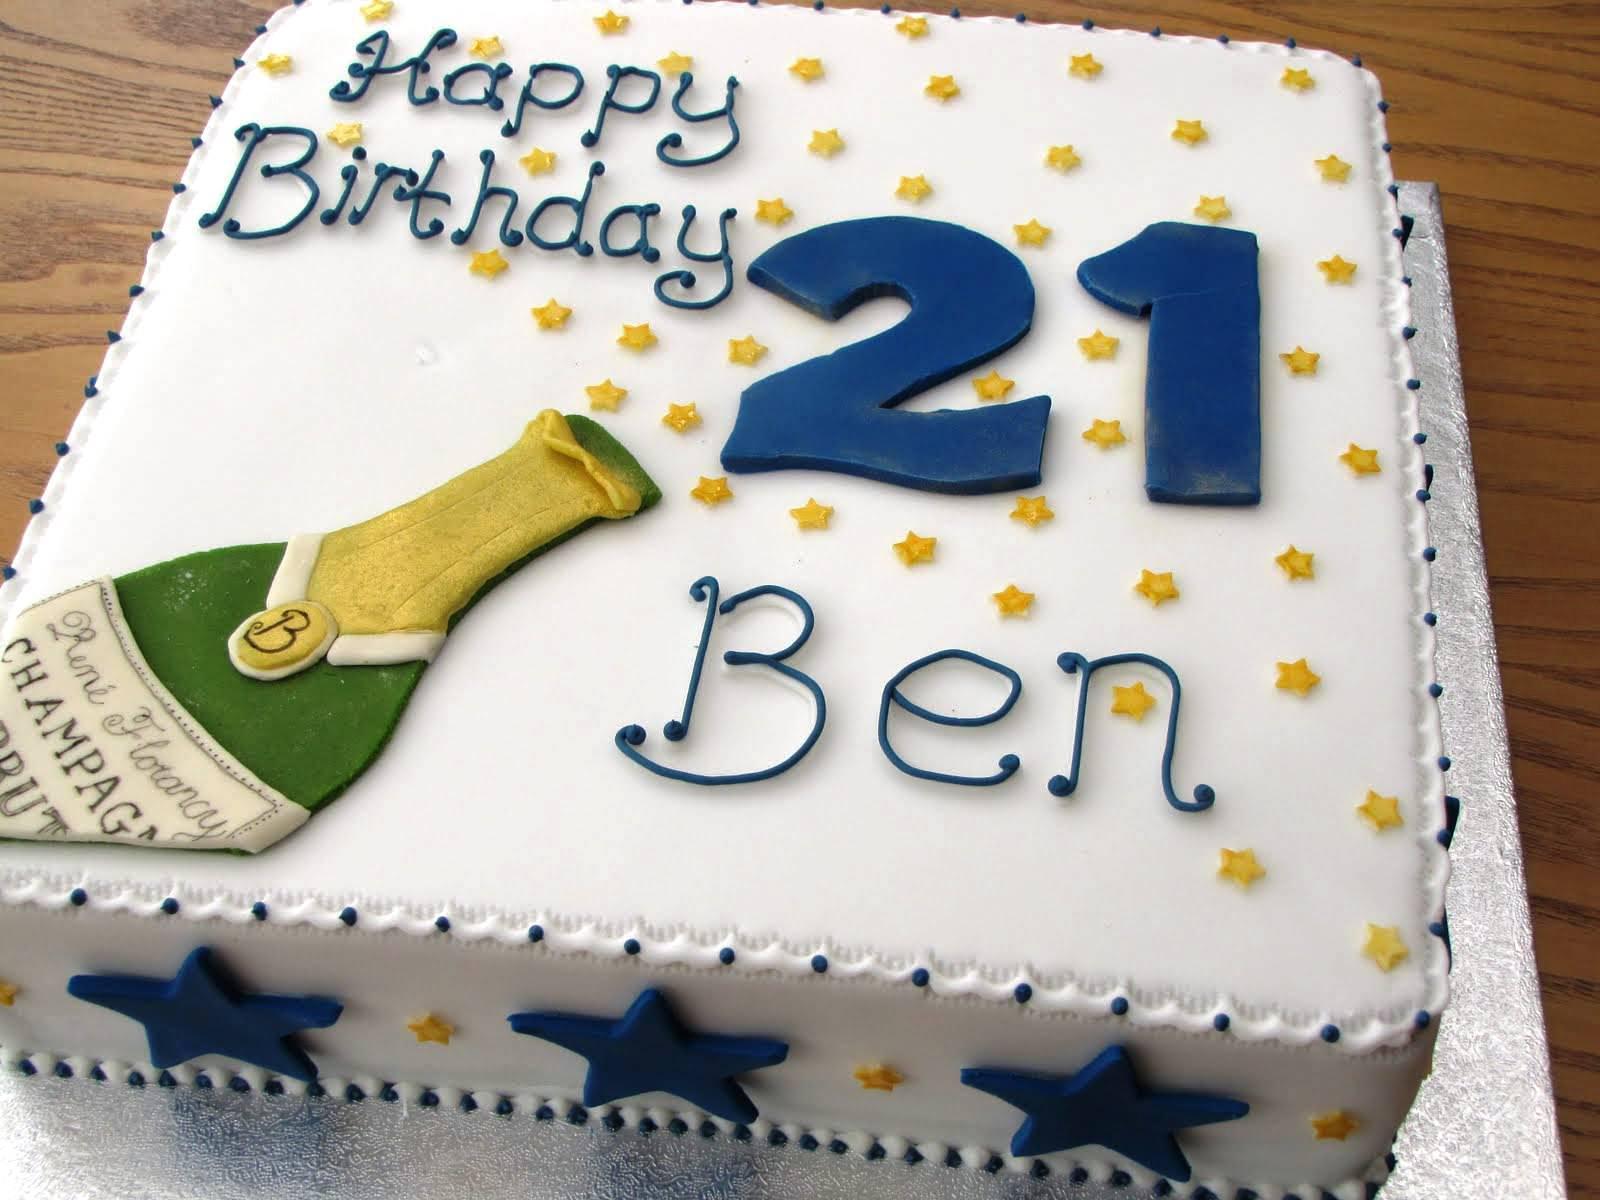 Phenomenal Customise This Cake Source Male Birthday Cake Design 802478 Funny Birthday Cards Online Alyptdamsfinfo